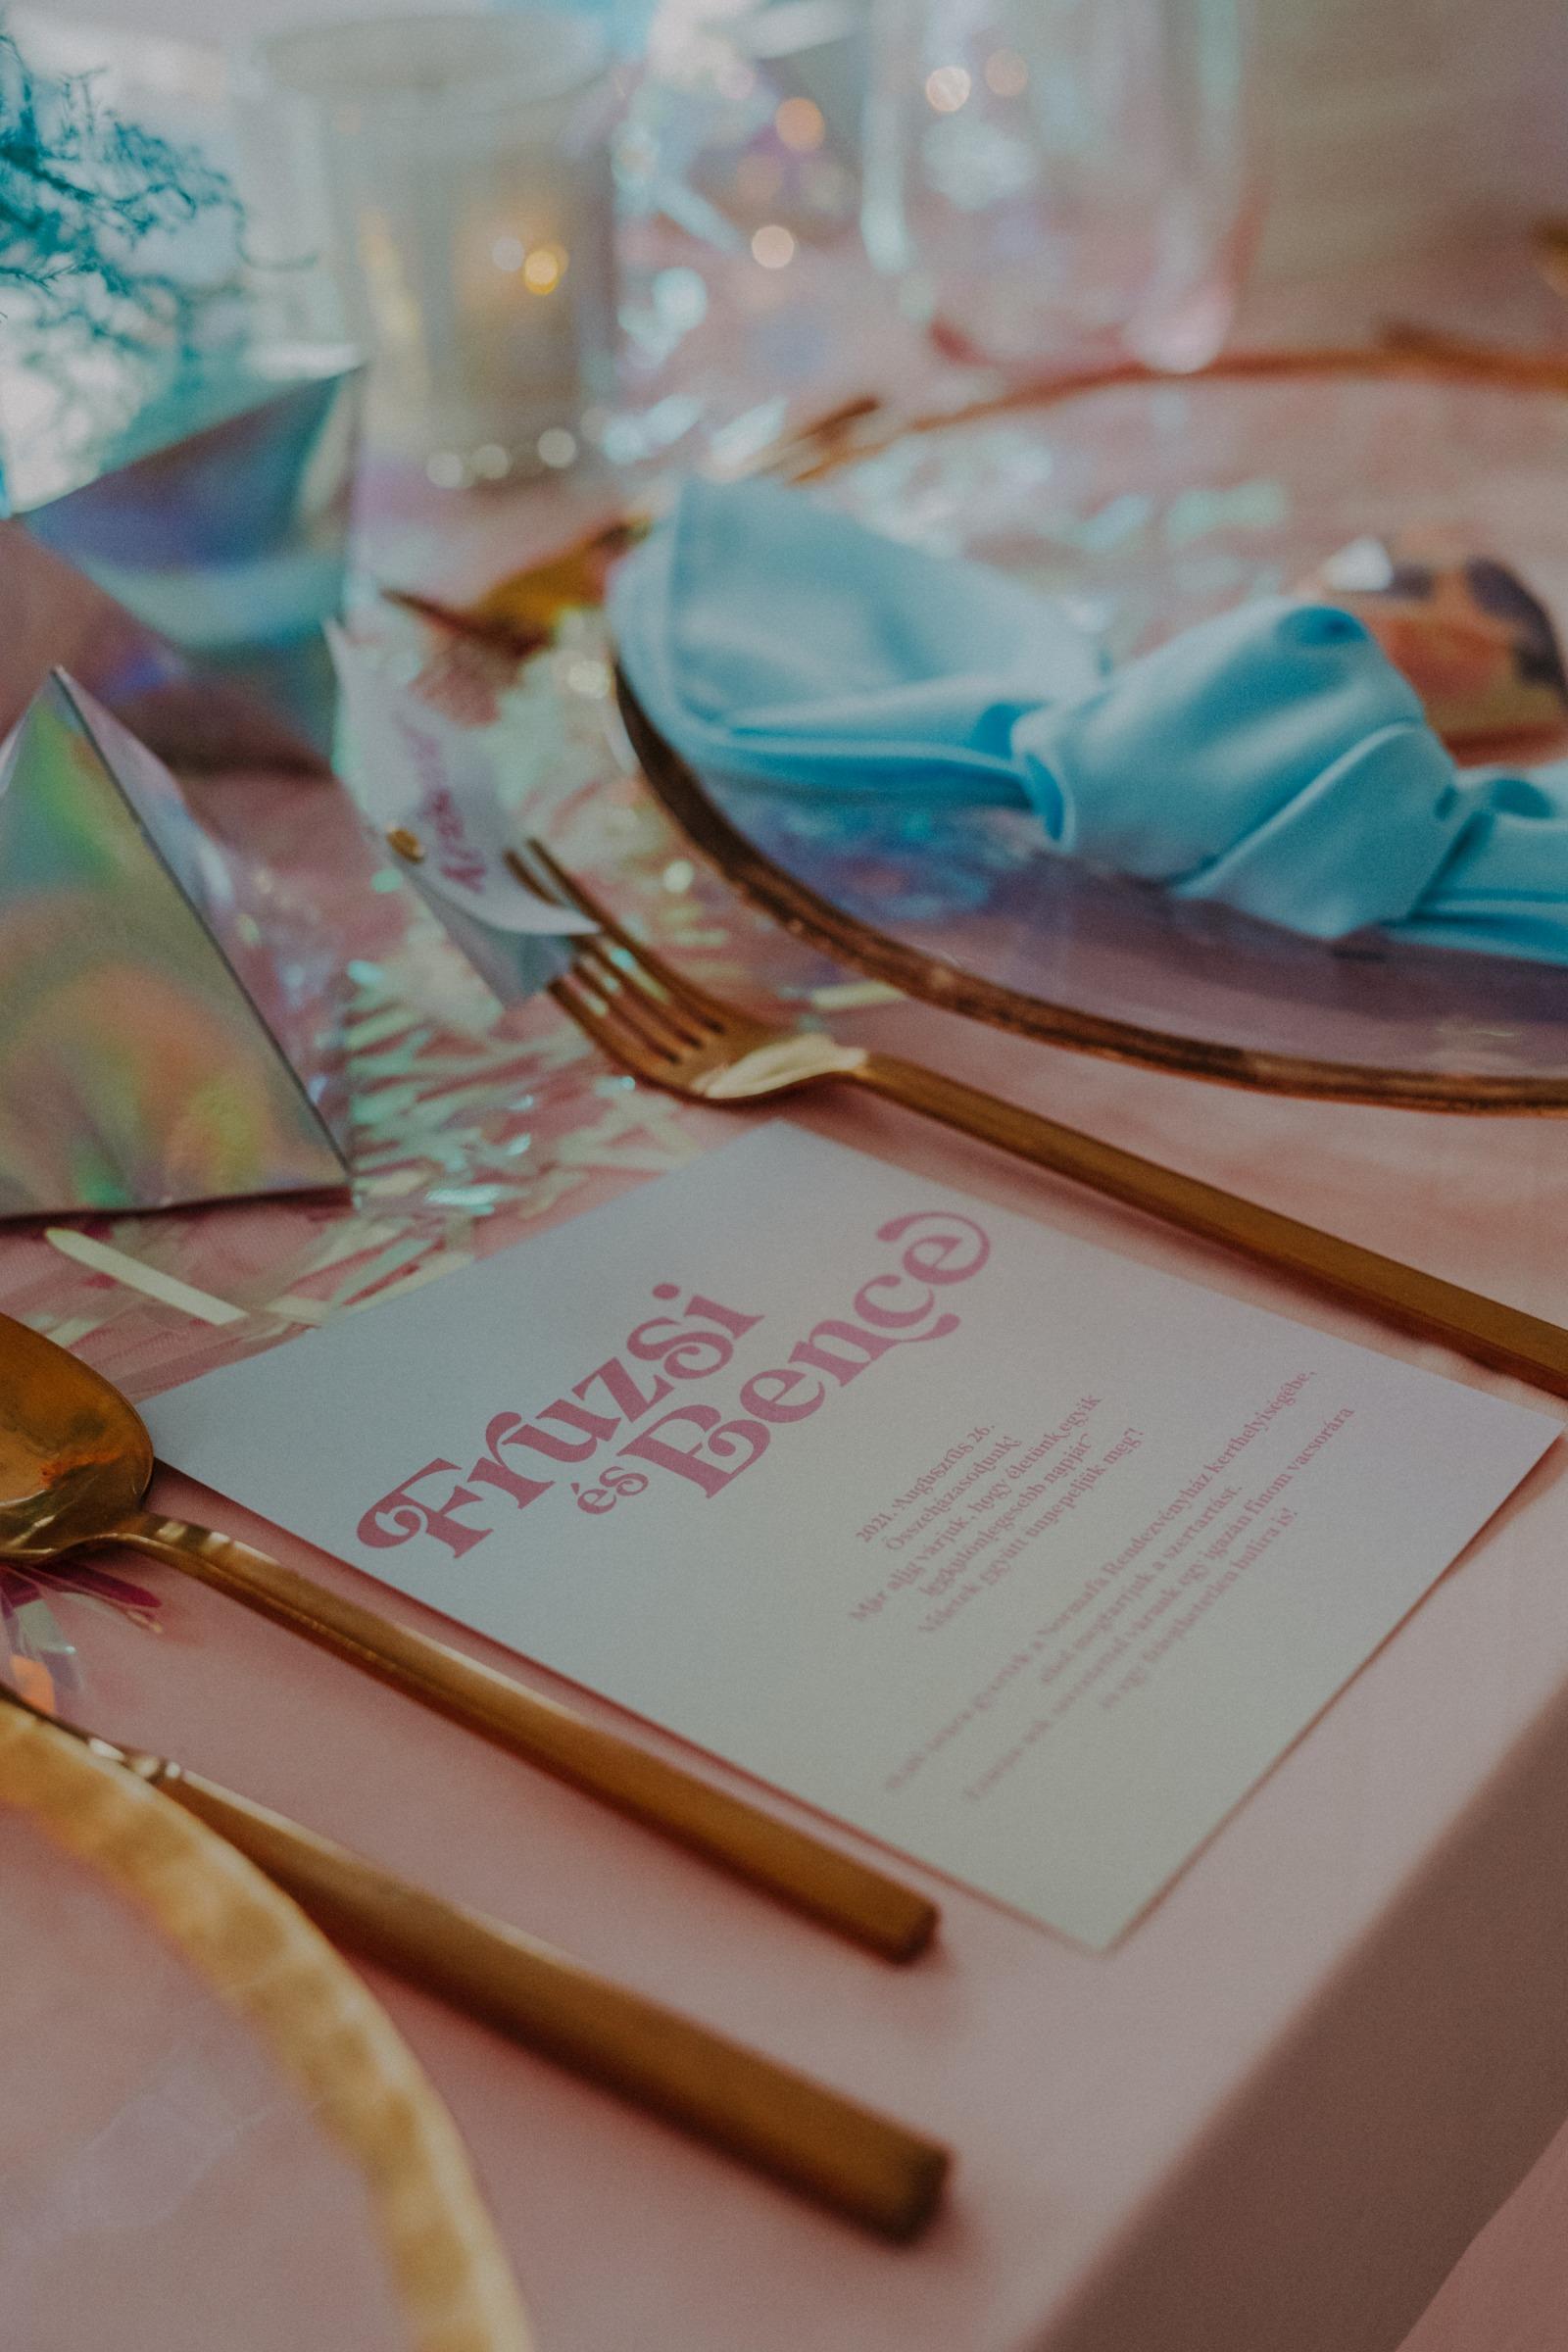 colourful pastel wedding - unconventional wedding - alternative wedding - unique wedding stationery - unique wedding menu